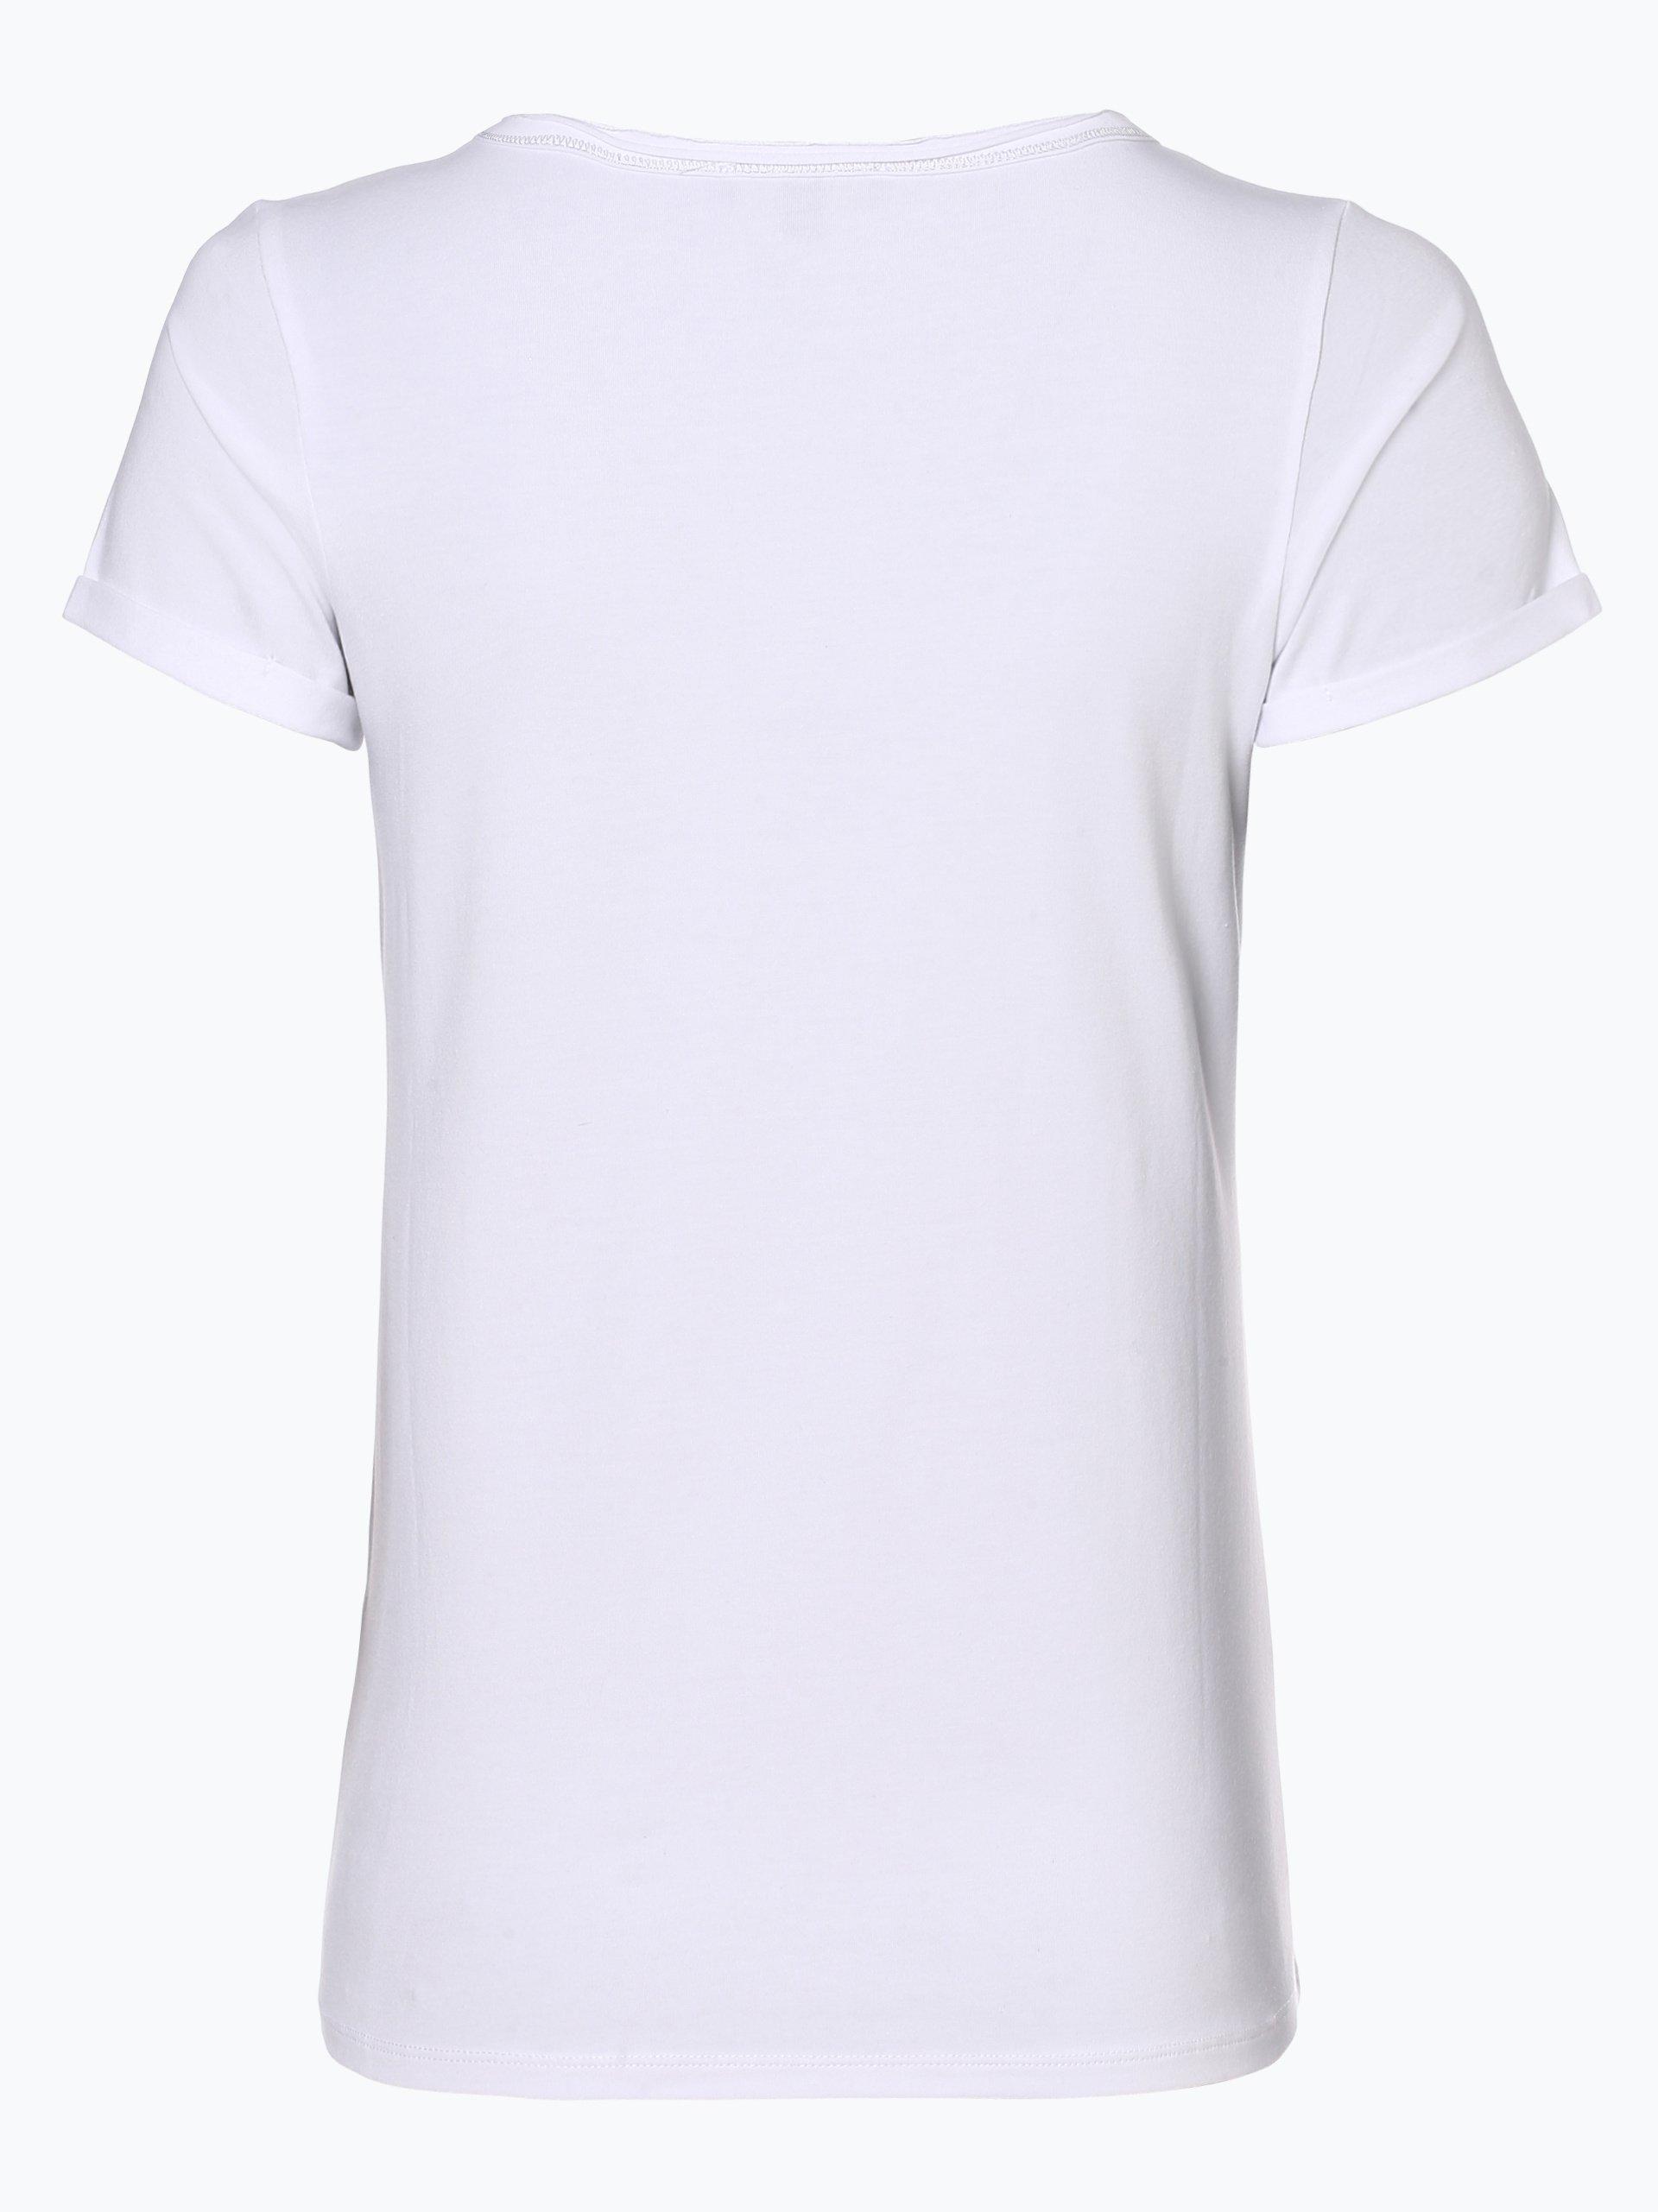 More & More T-shirt damski